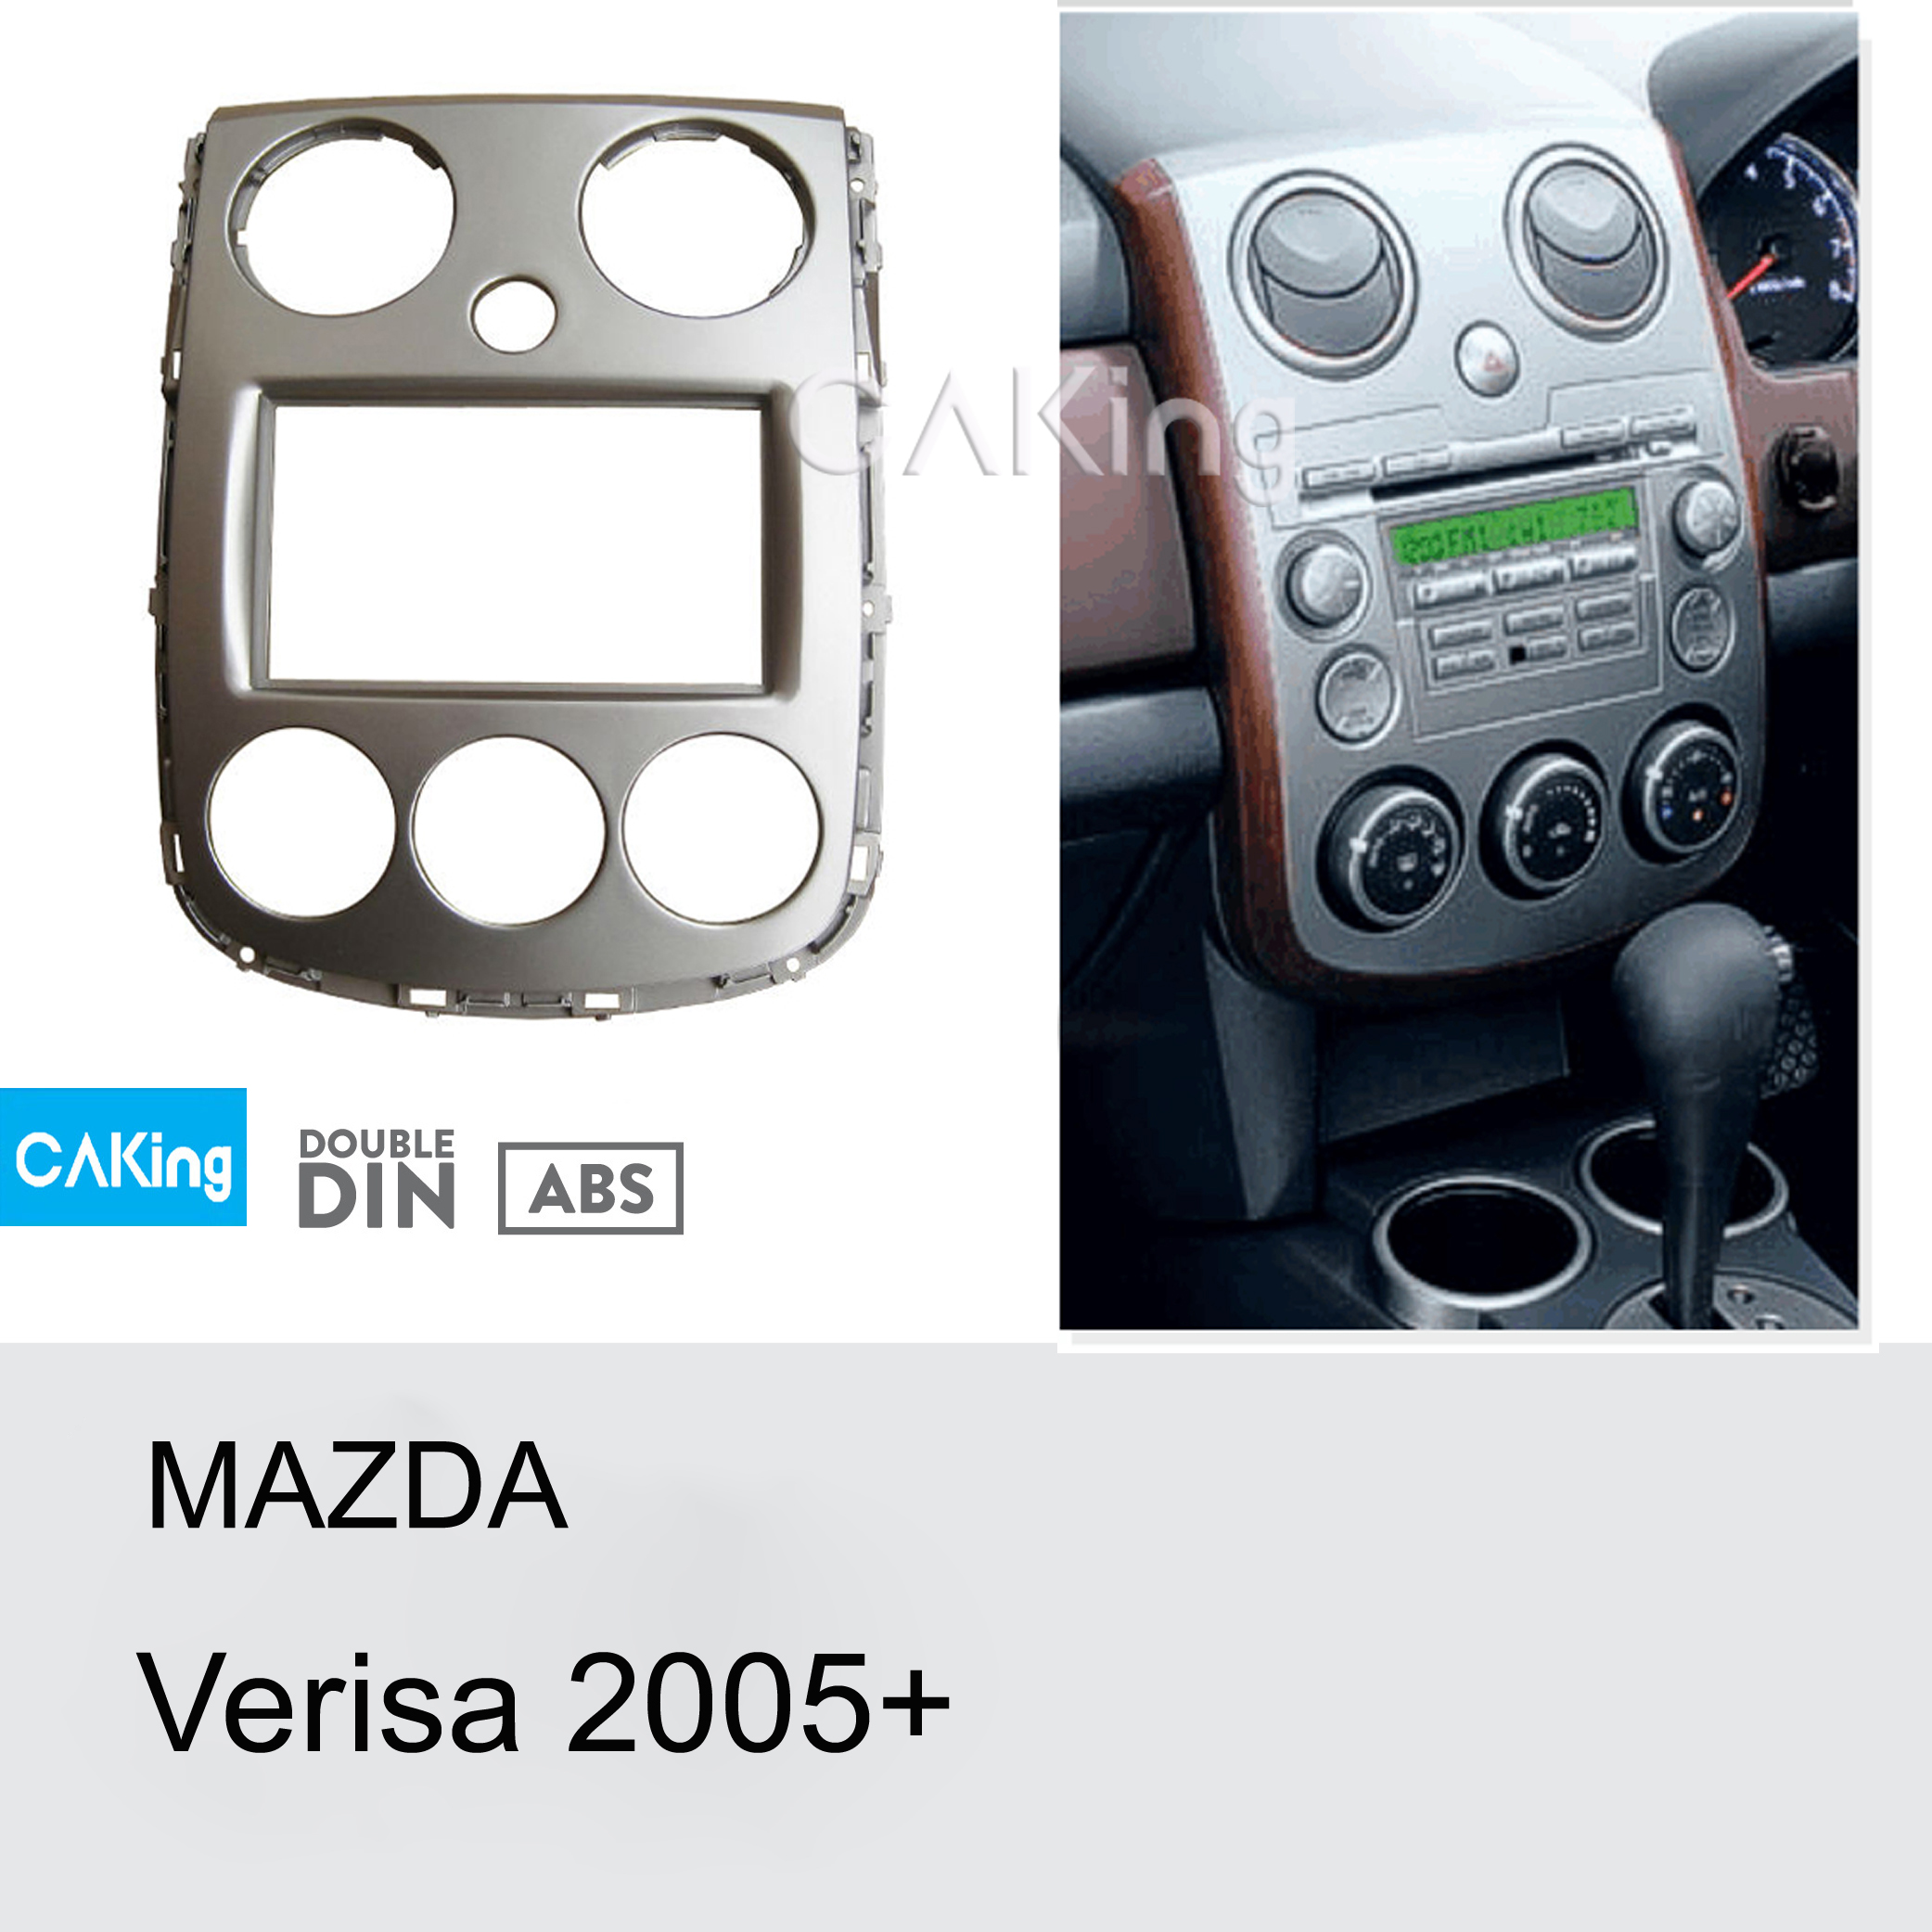 Double Din Car Fascia Radio Panel for Mazda Verisa 2005 Dash Fitting Kit Install Facia Plate